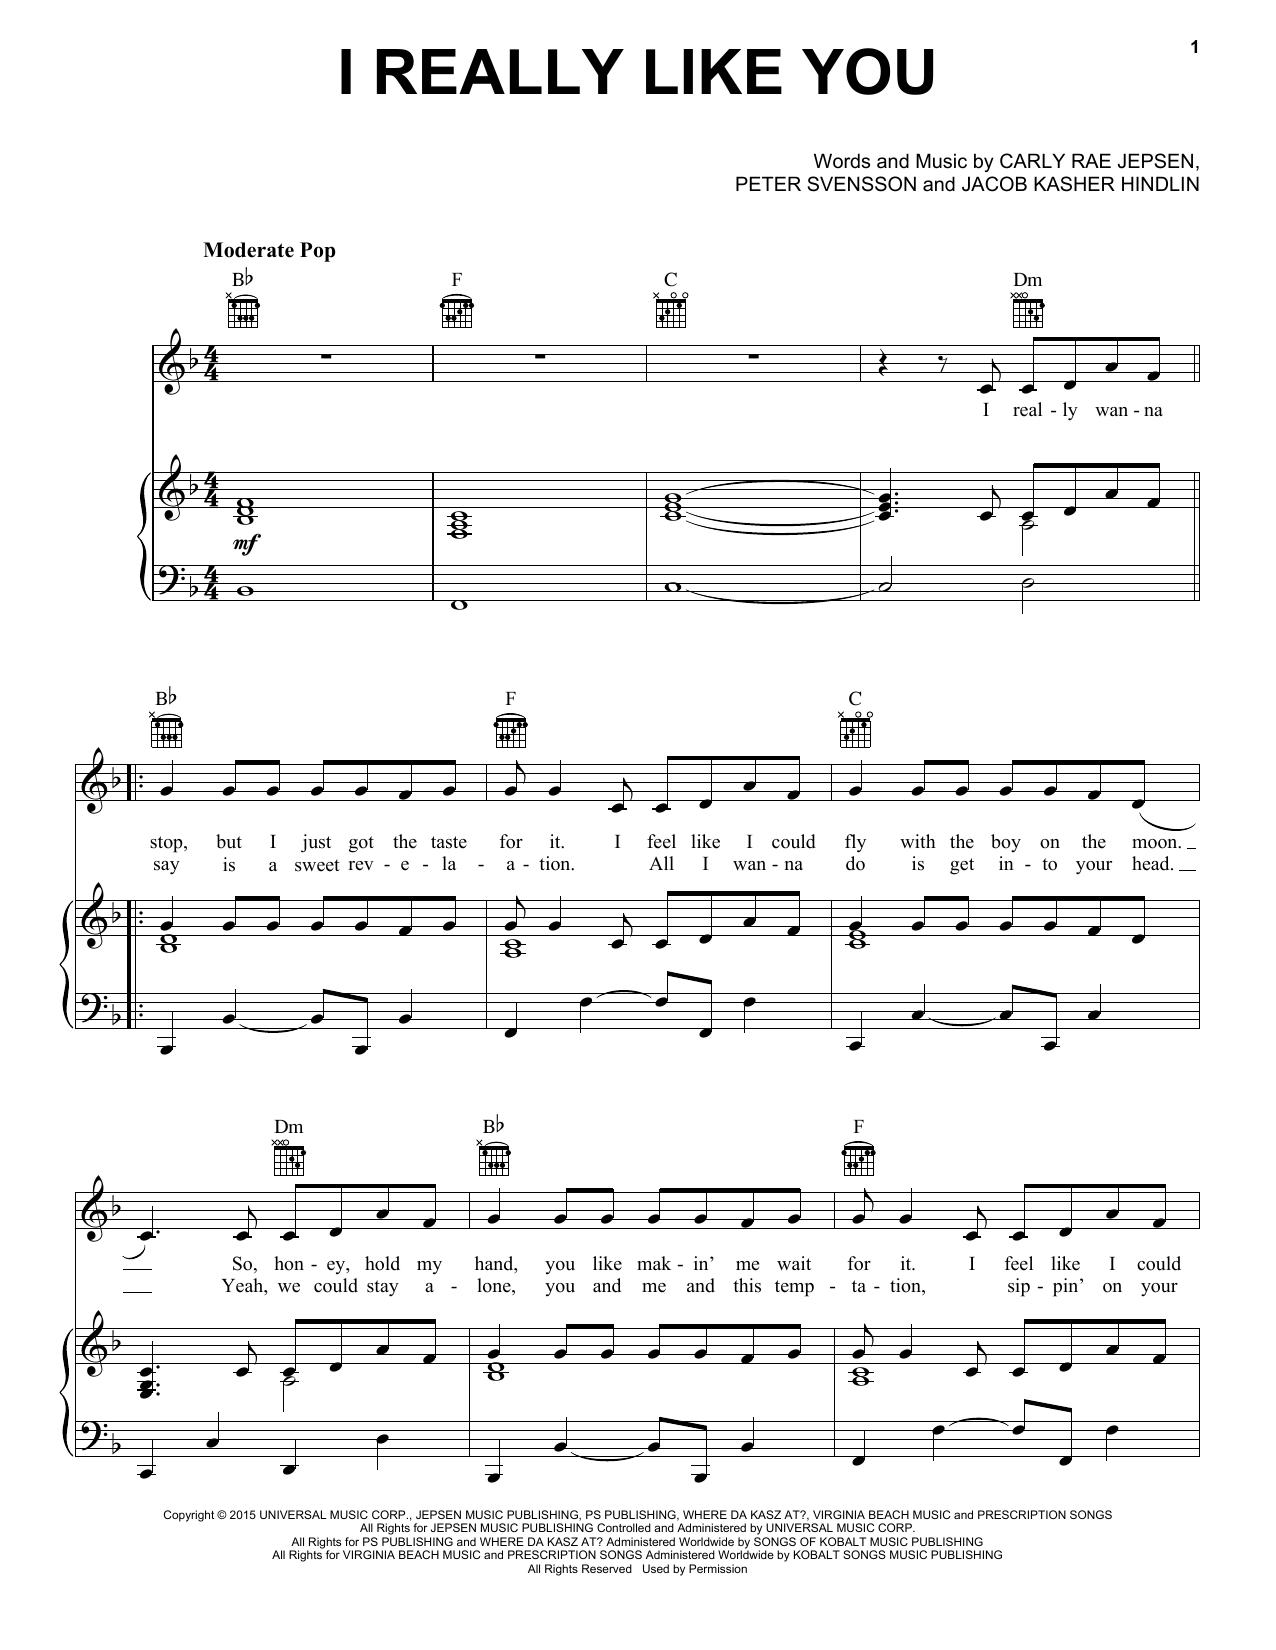 Carly rae jepsen i really like you sheet music partition noten carly rae jepsen i really like you sheet music partition noten piano hexwebz Gallery